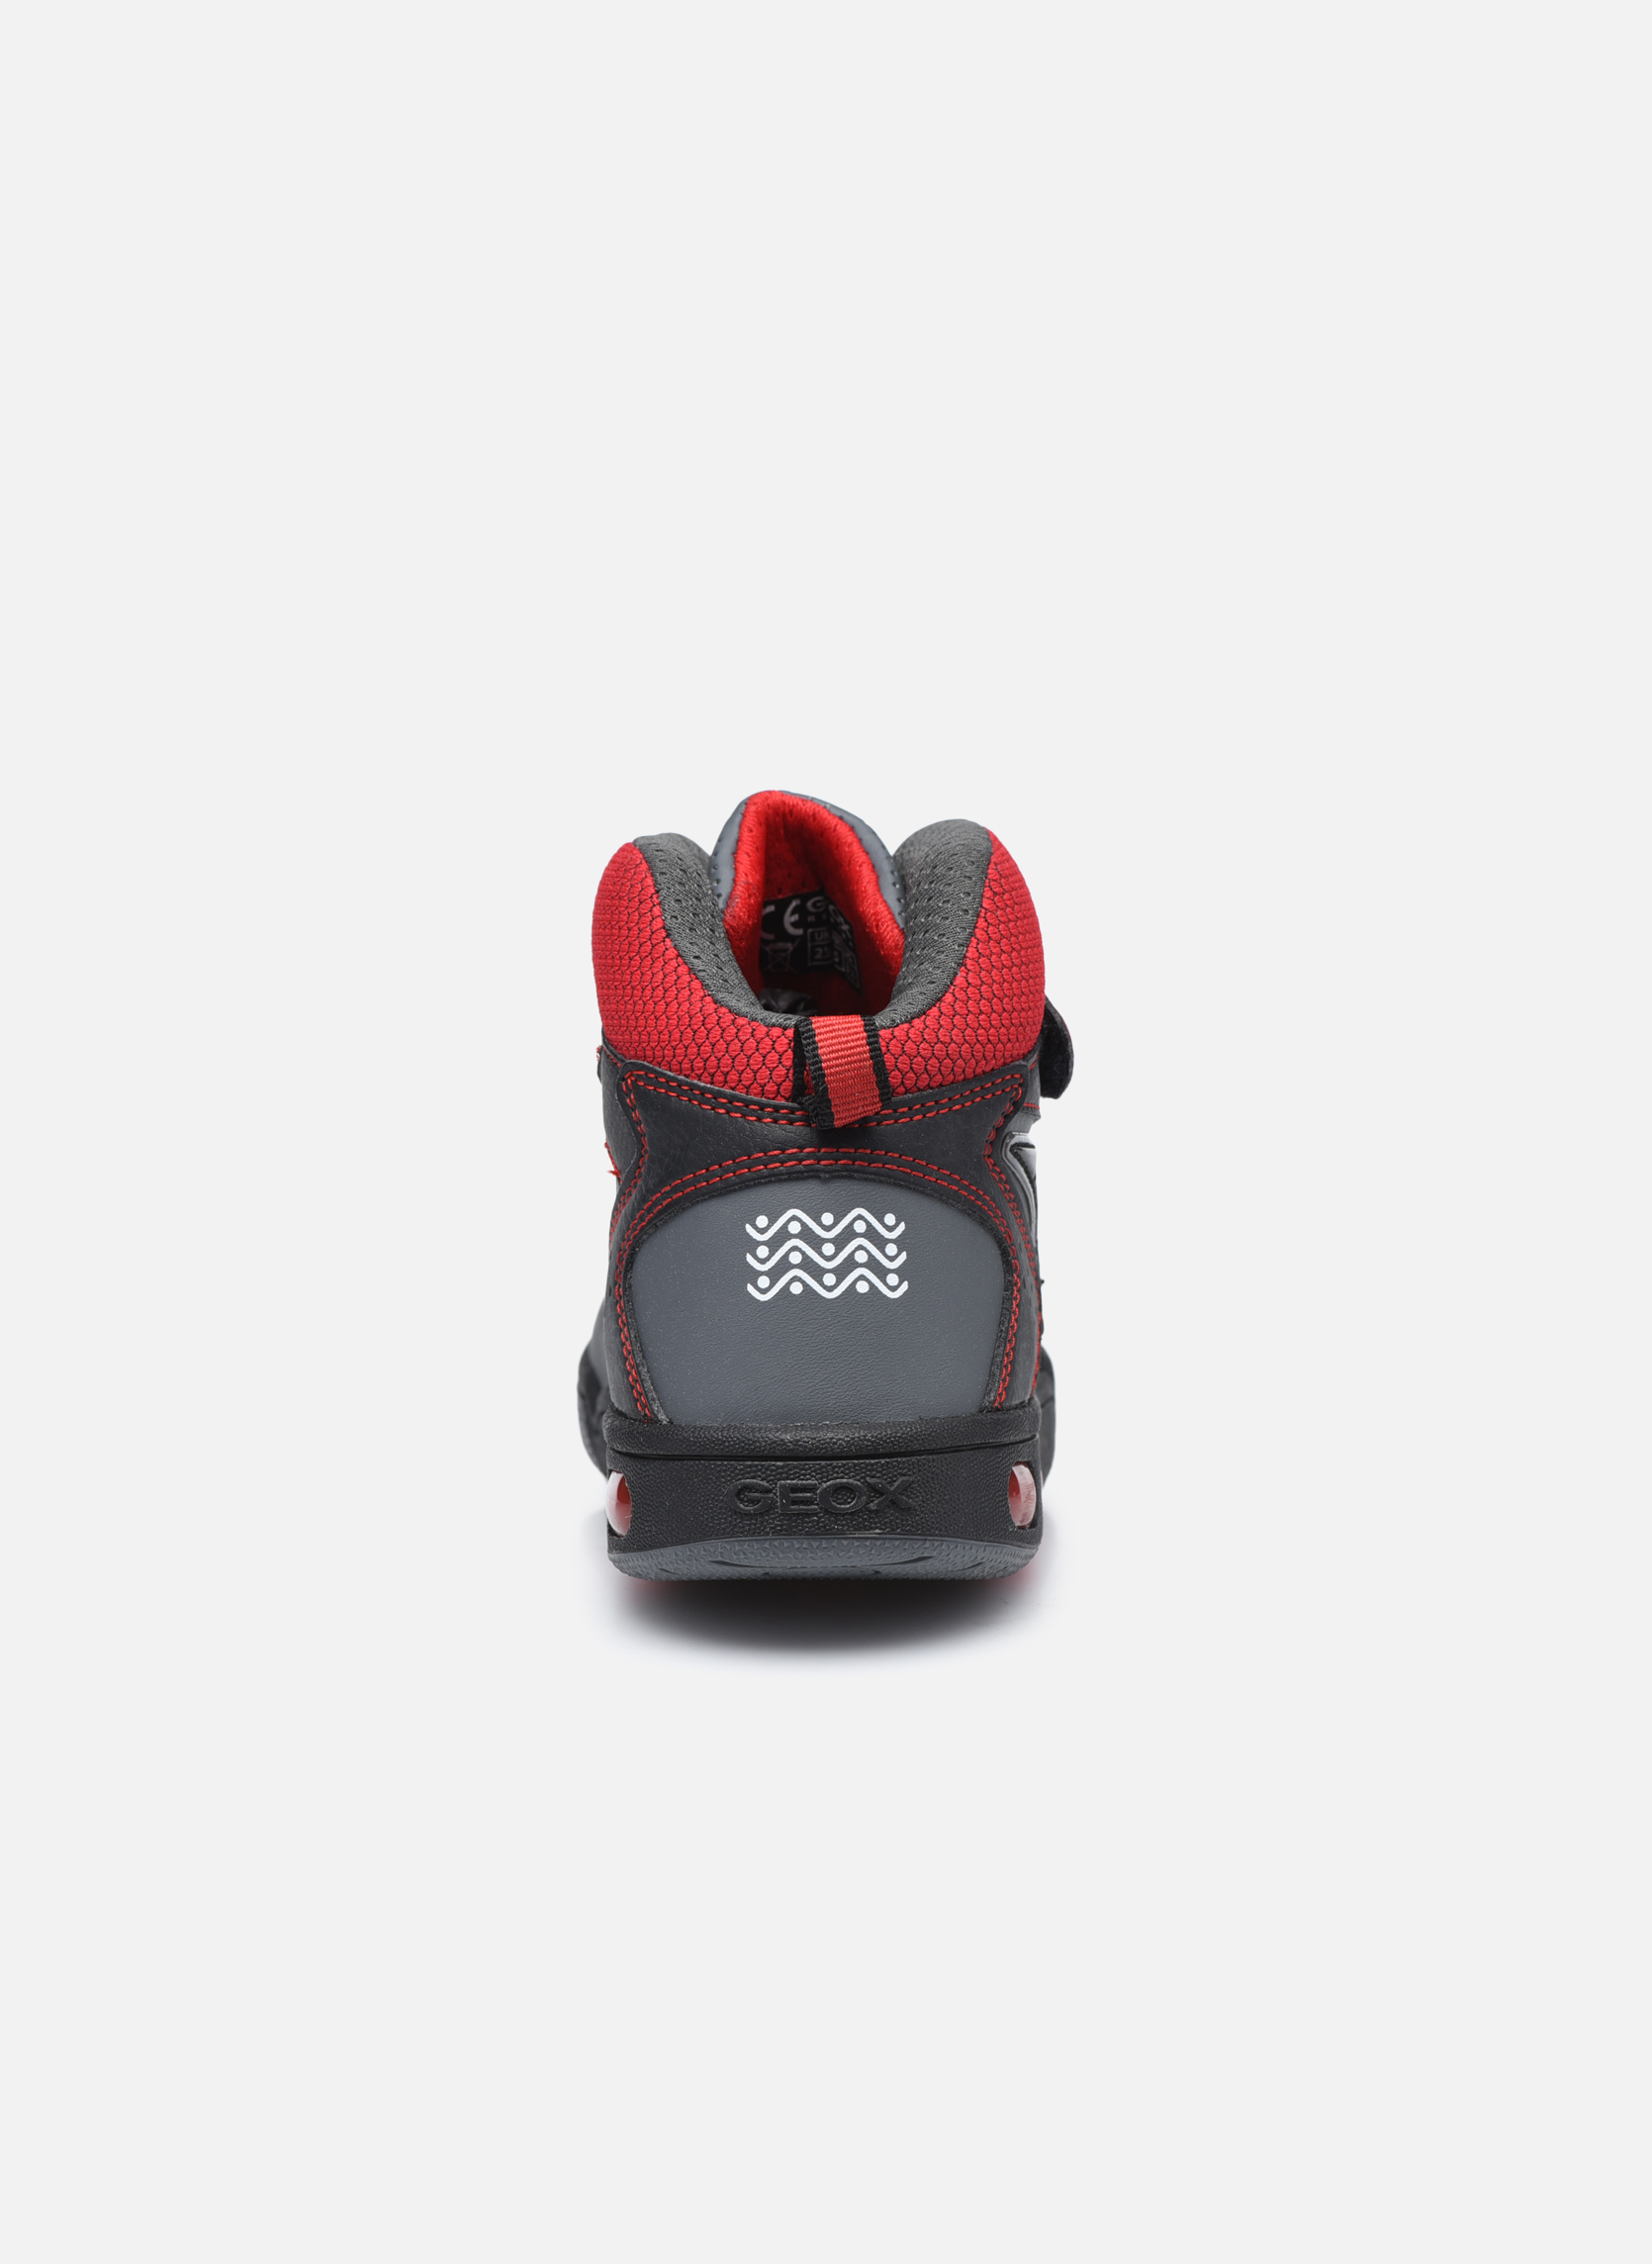 J Gregg A J7447A Black/red